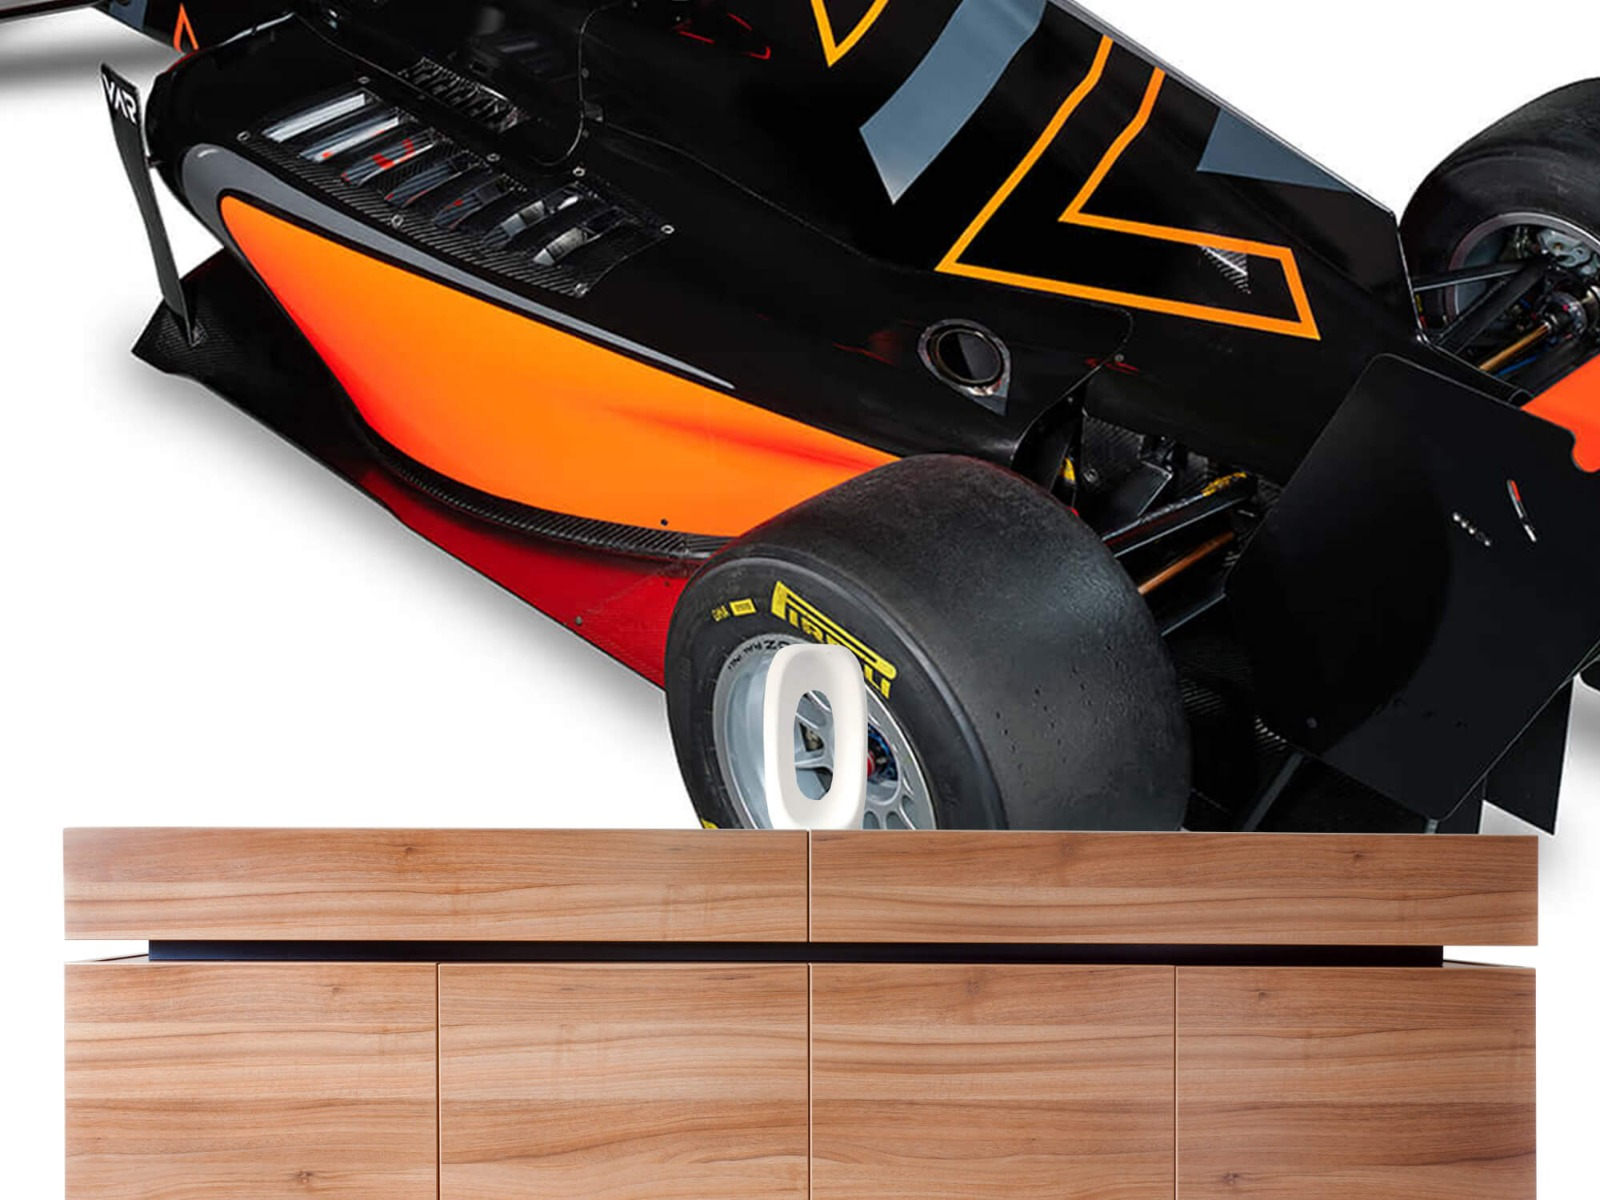 Sportauto's - Formula 3 - Rear left view - Hobbykamer 20